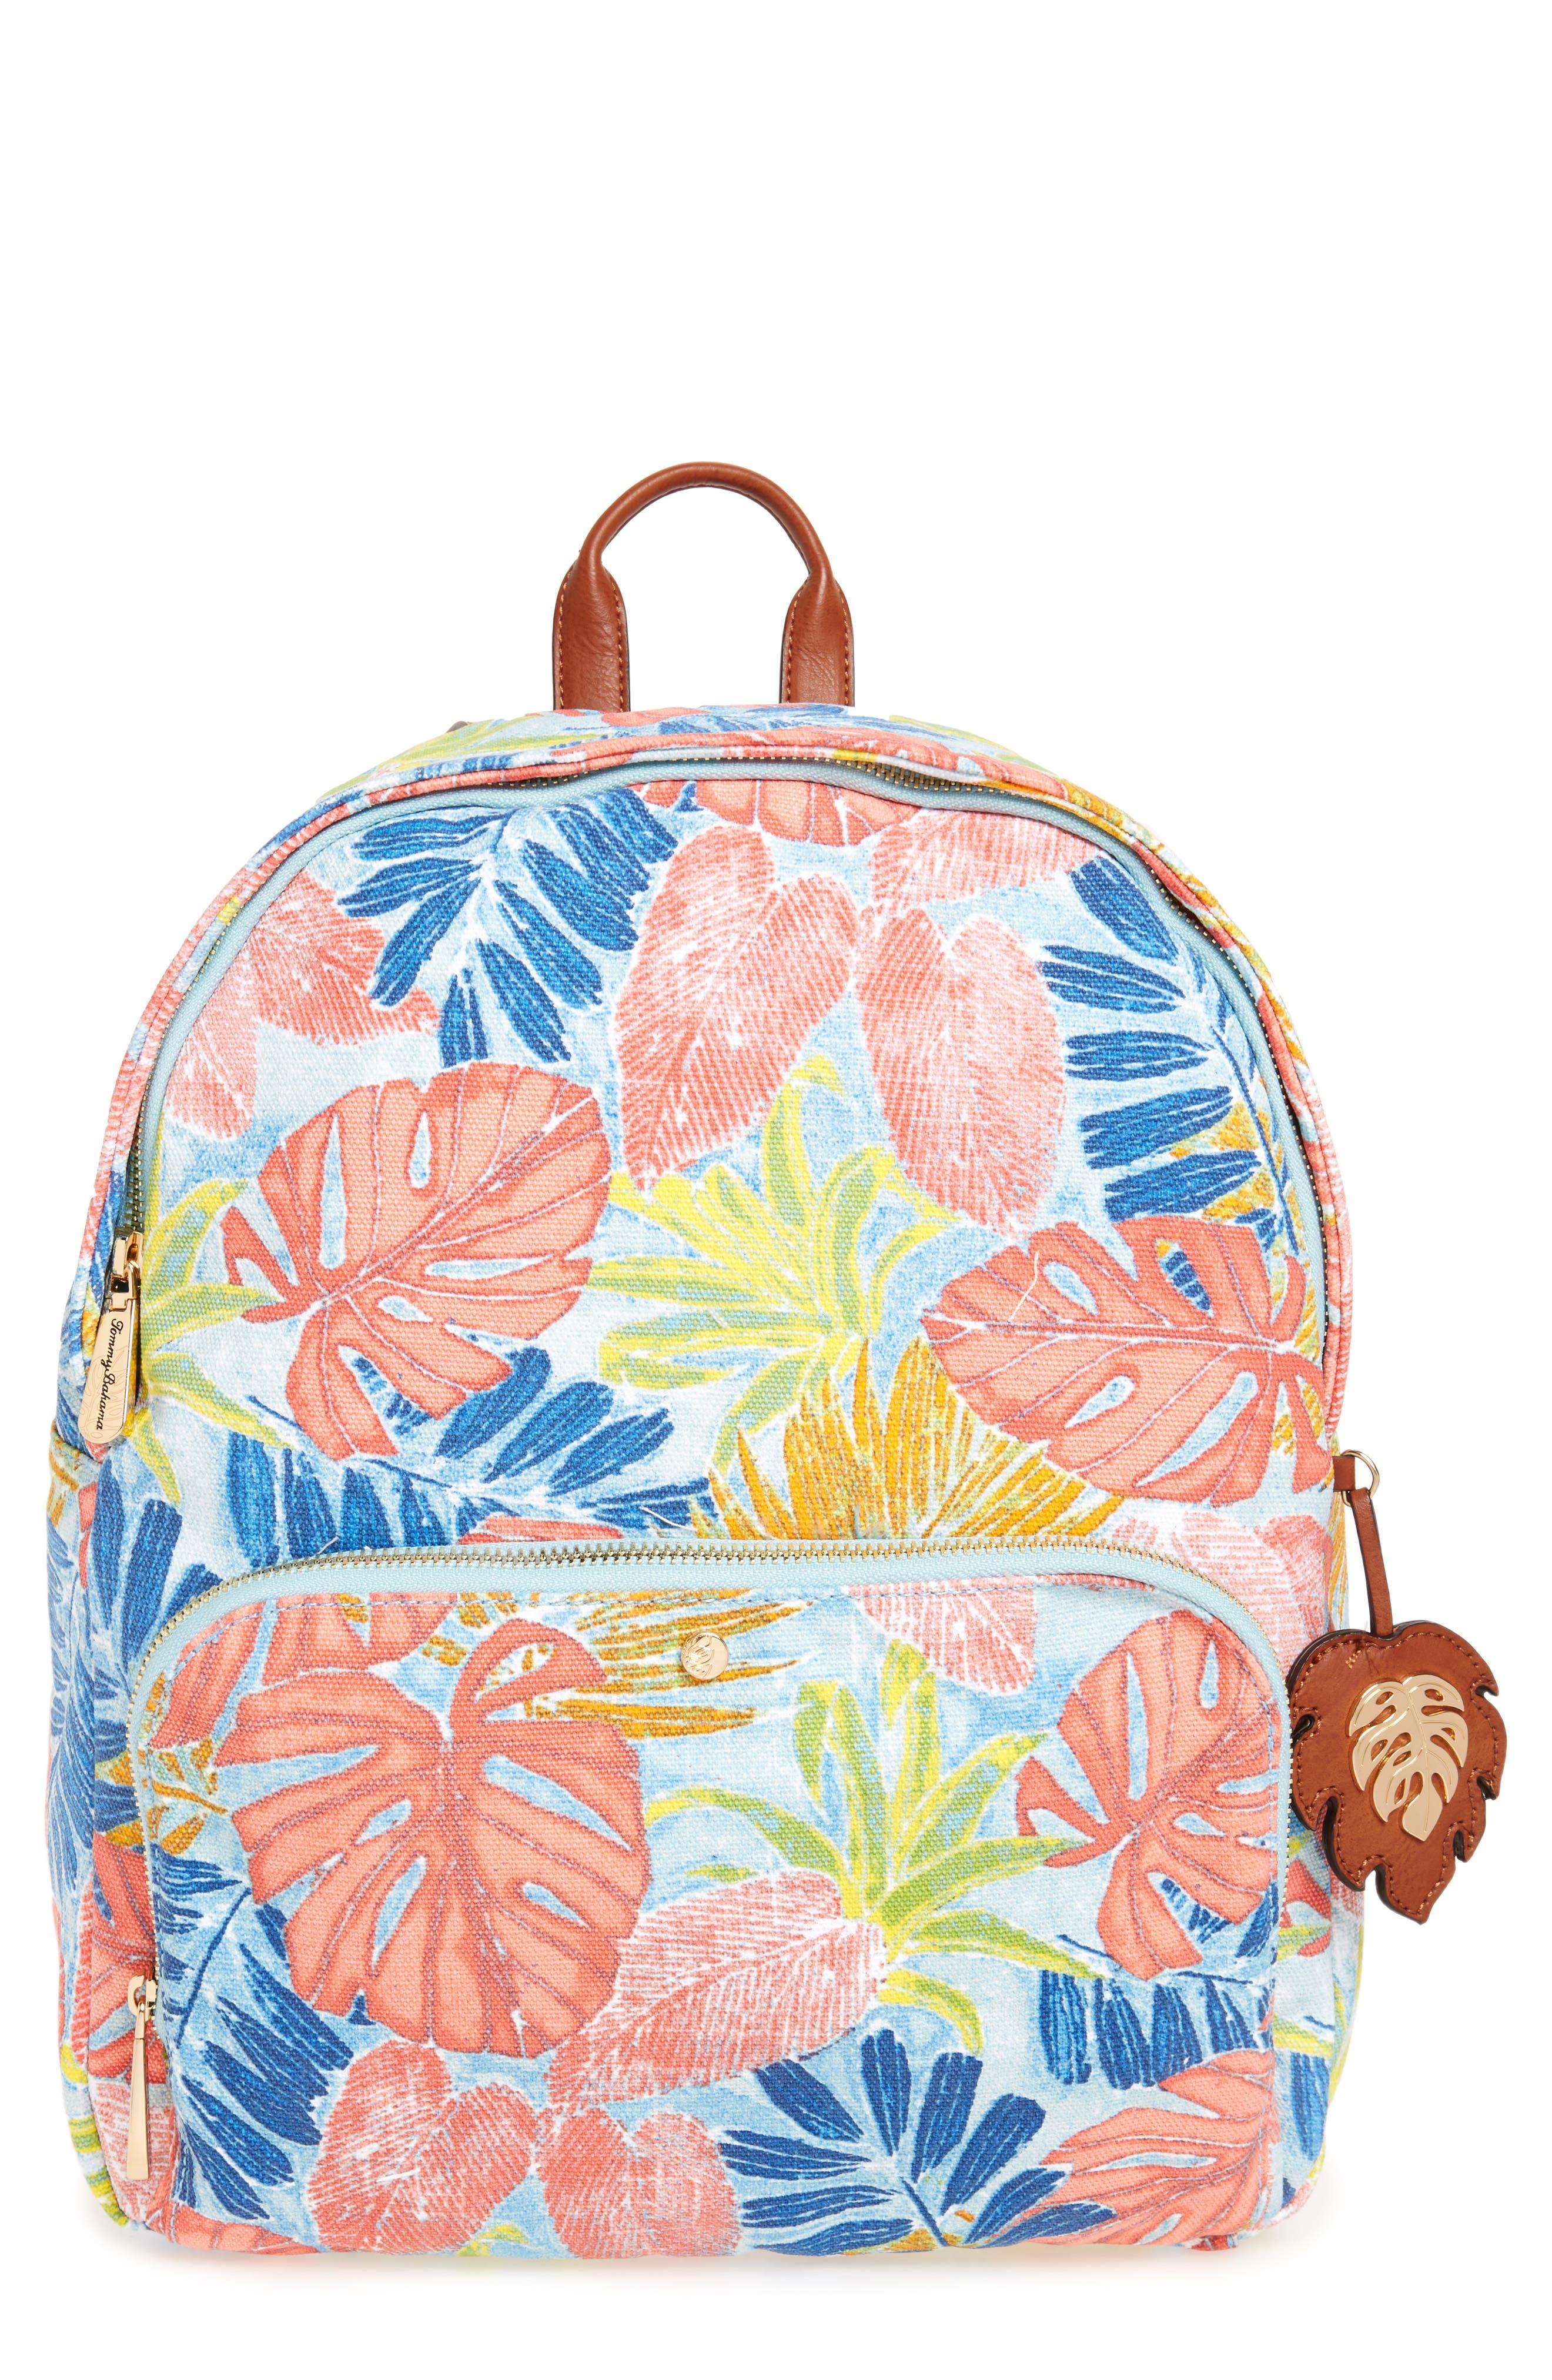 Maui Backpack,                             Main thumbnail 1, color,                             Artsy Leaf